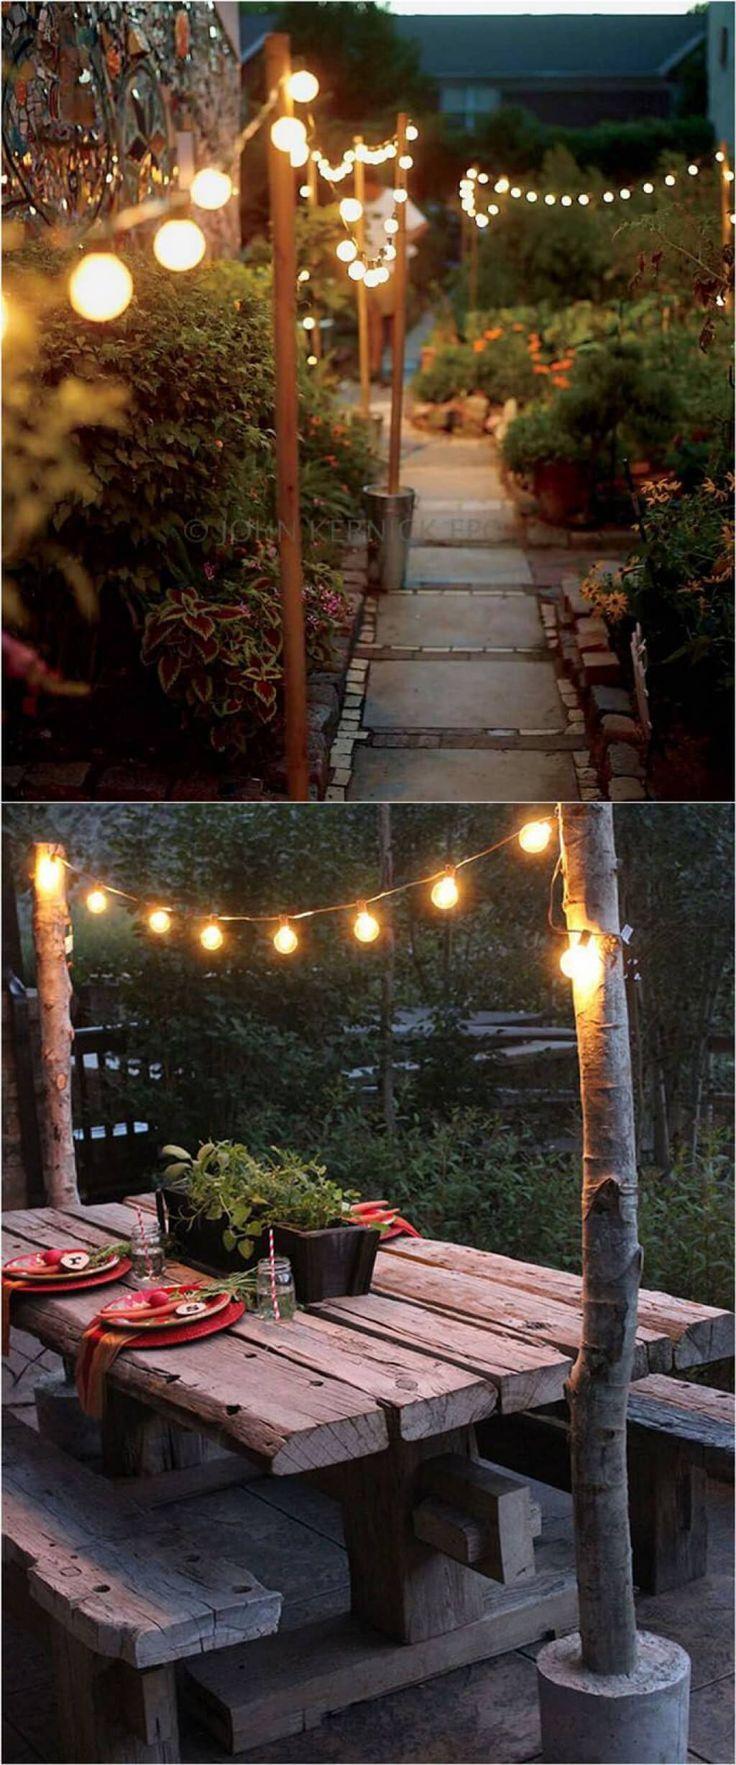 Best Outdoor Lighting Idea You Need To Have Today Pin Diy Outdoor Lighting Garden Path Lighting Backyard Lighting